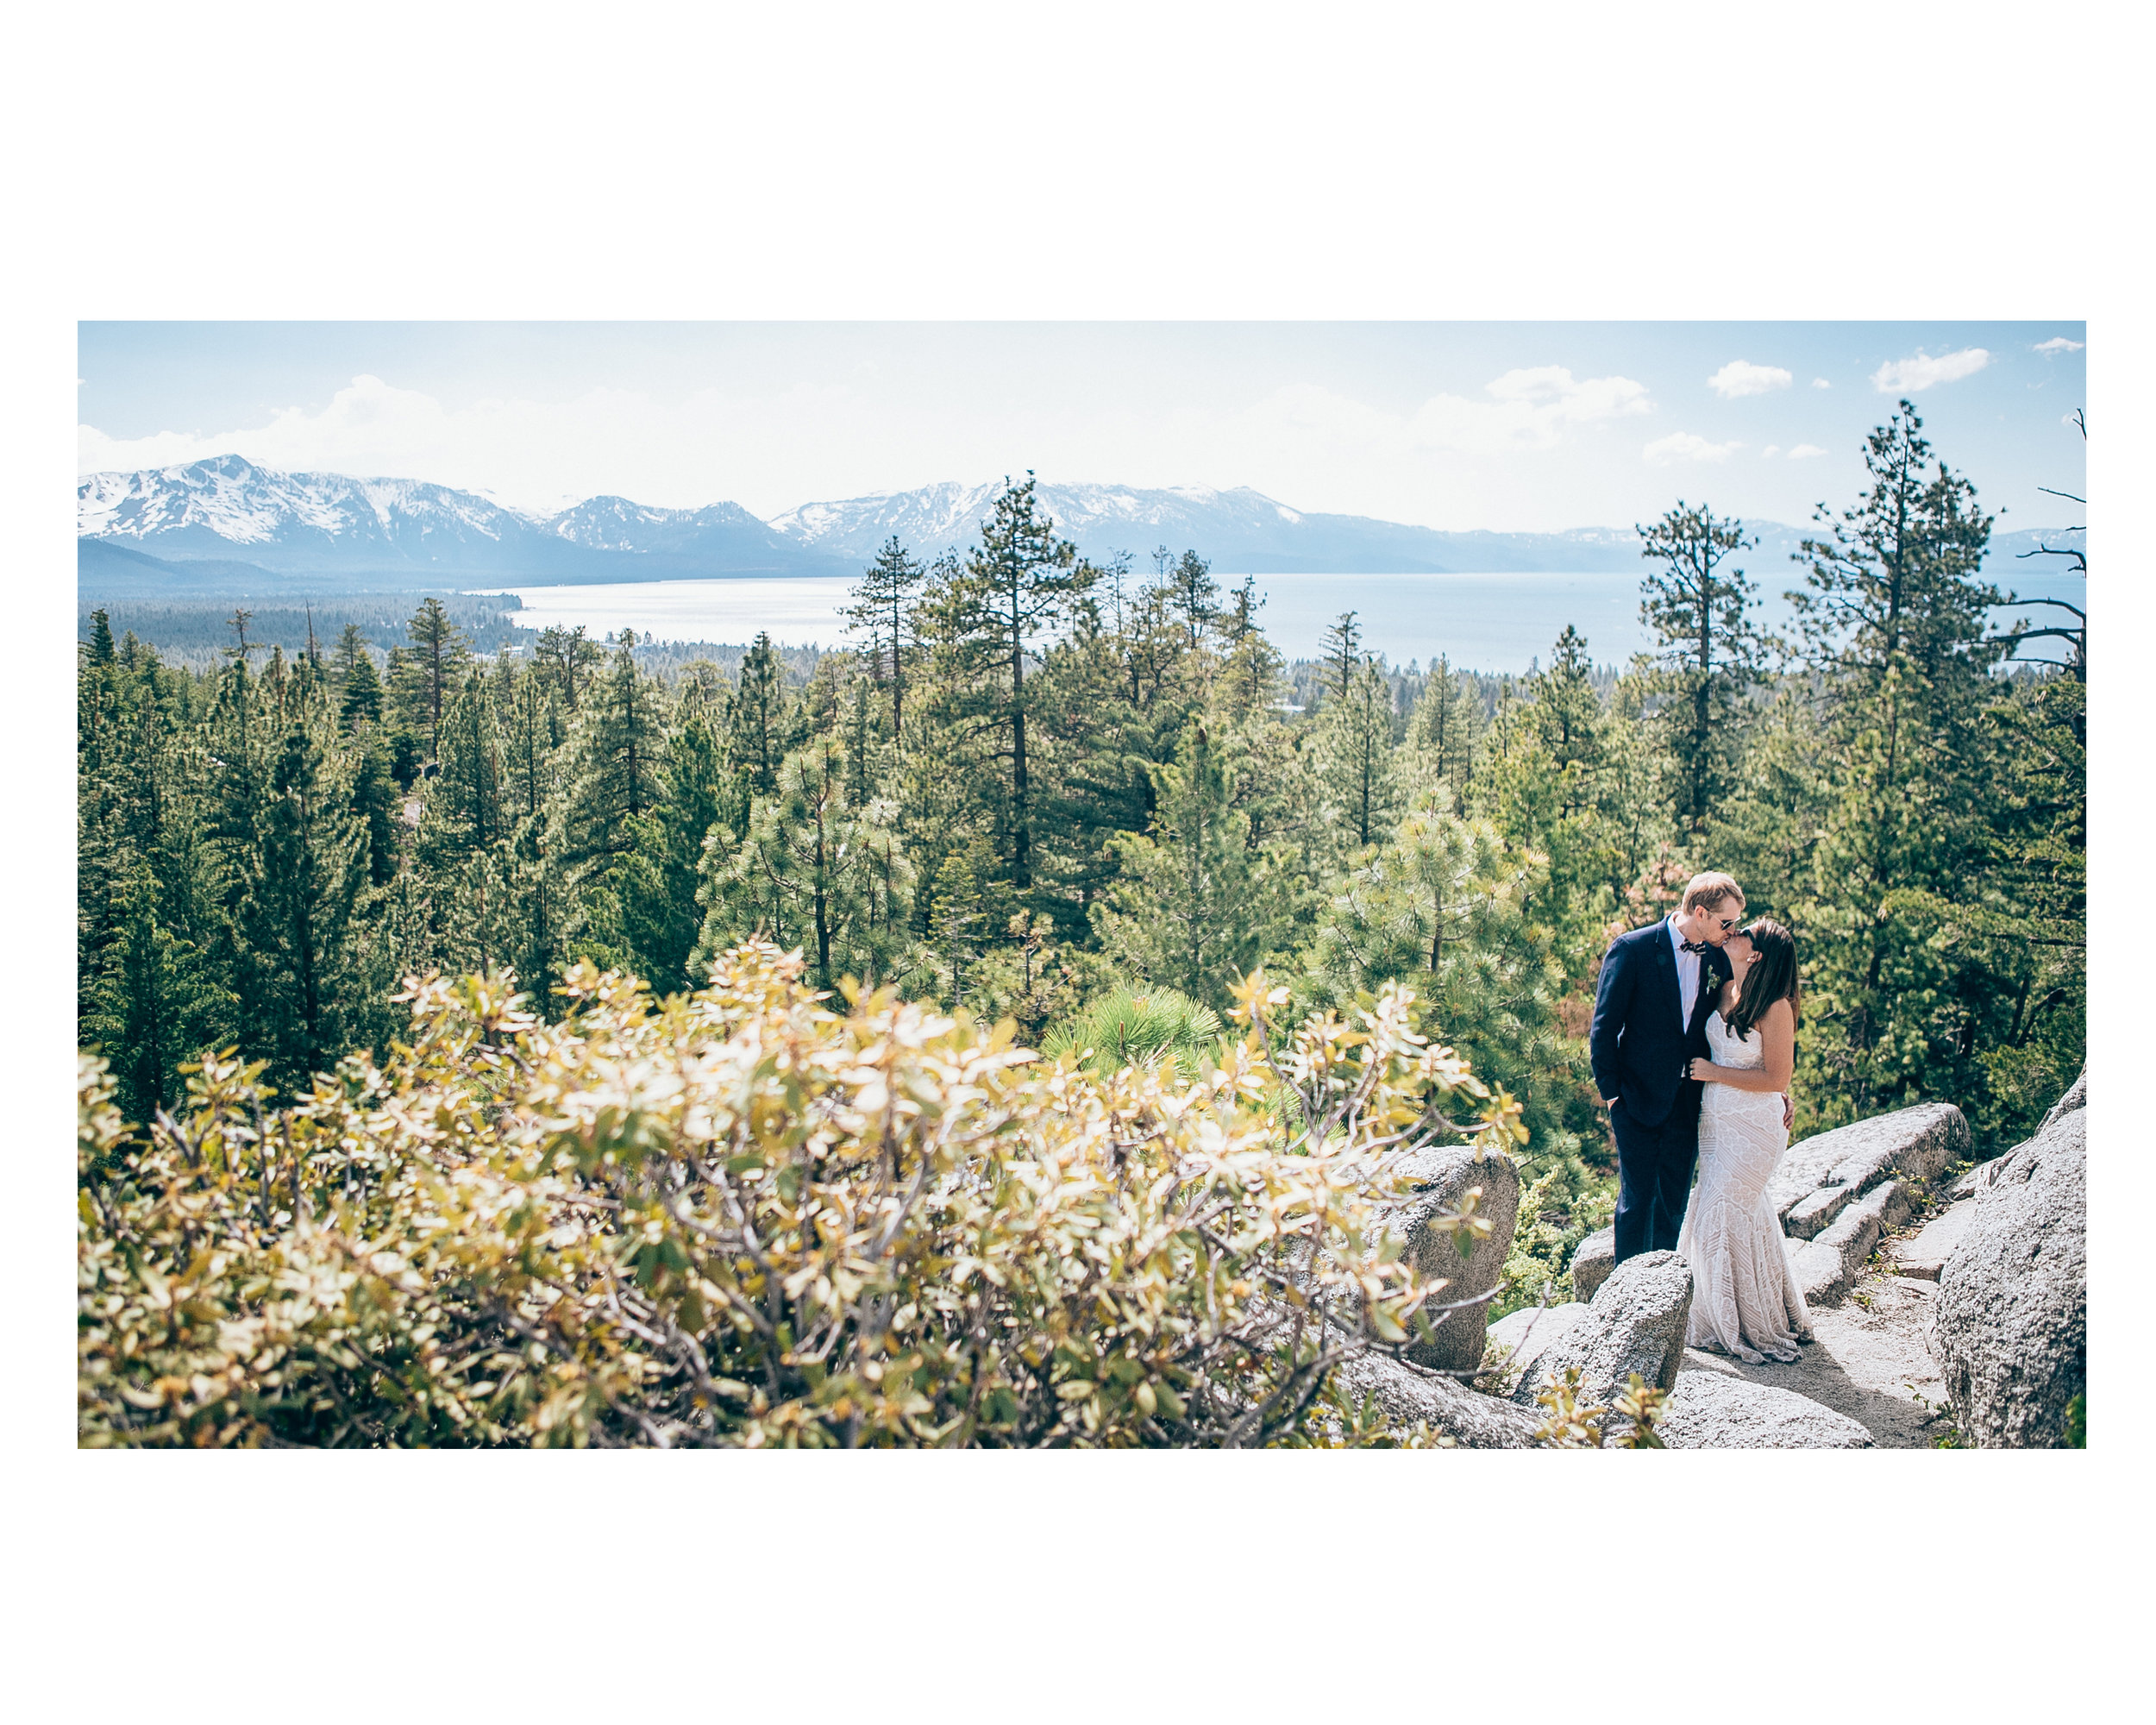 Melisa&David_Wedding_Day_023.jpg